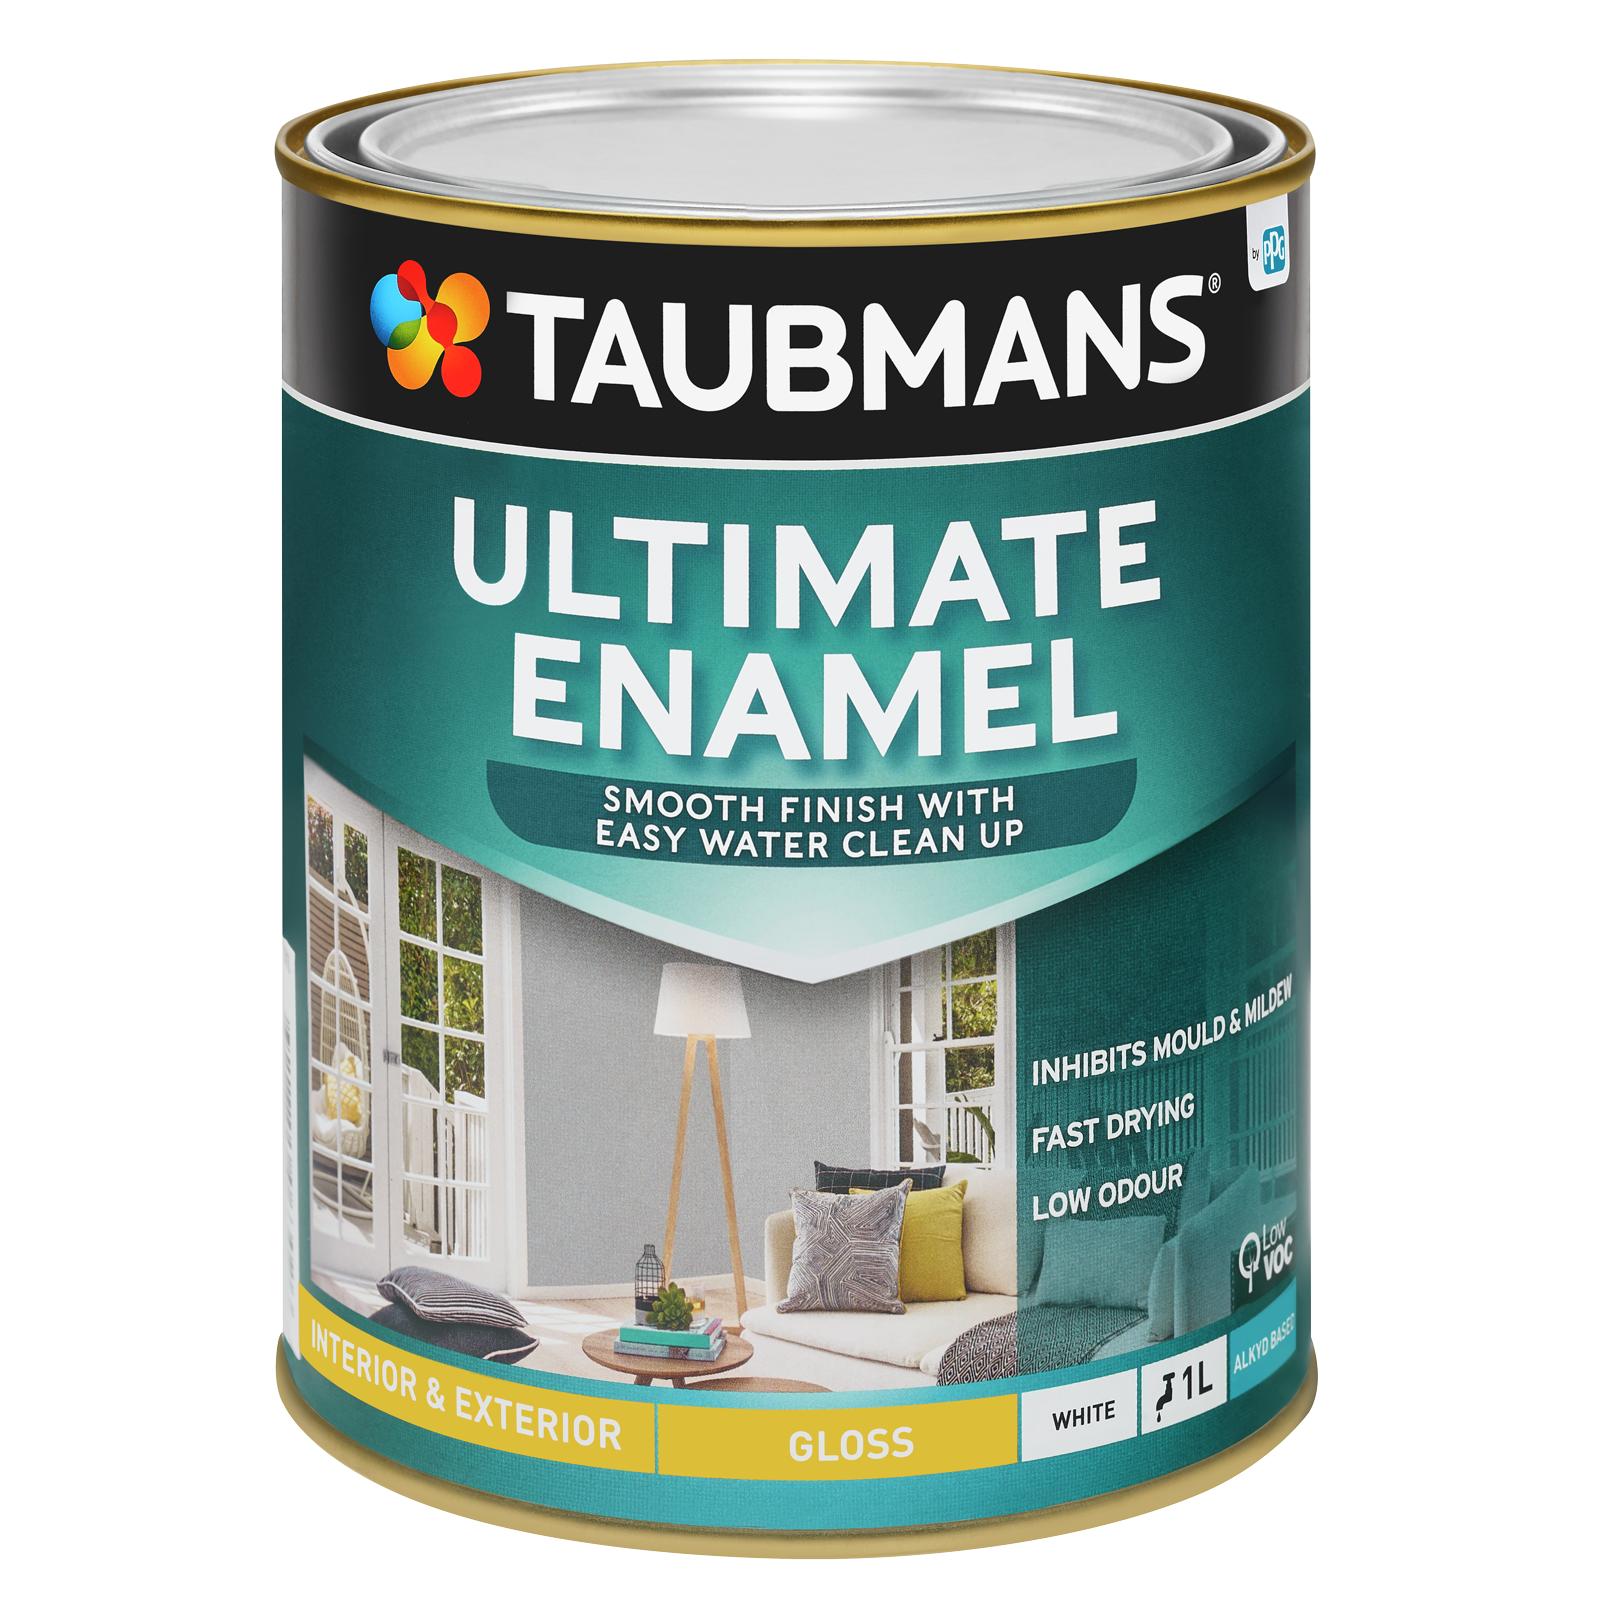 Taubmans Ultimate Enamel White Gloss Enamel - 1L